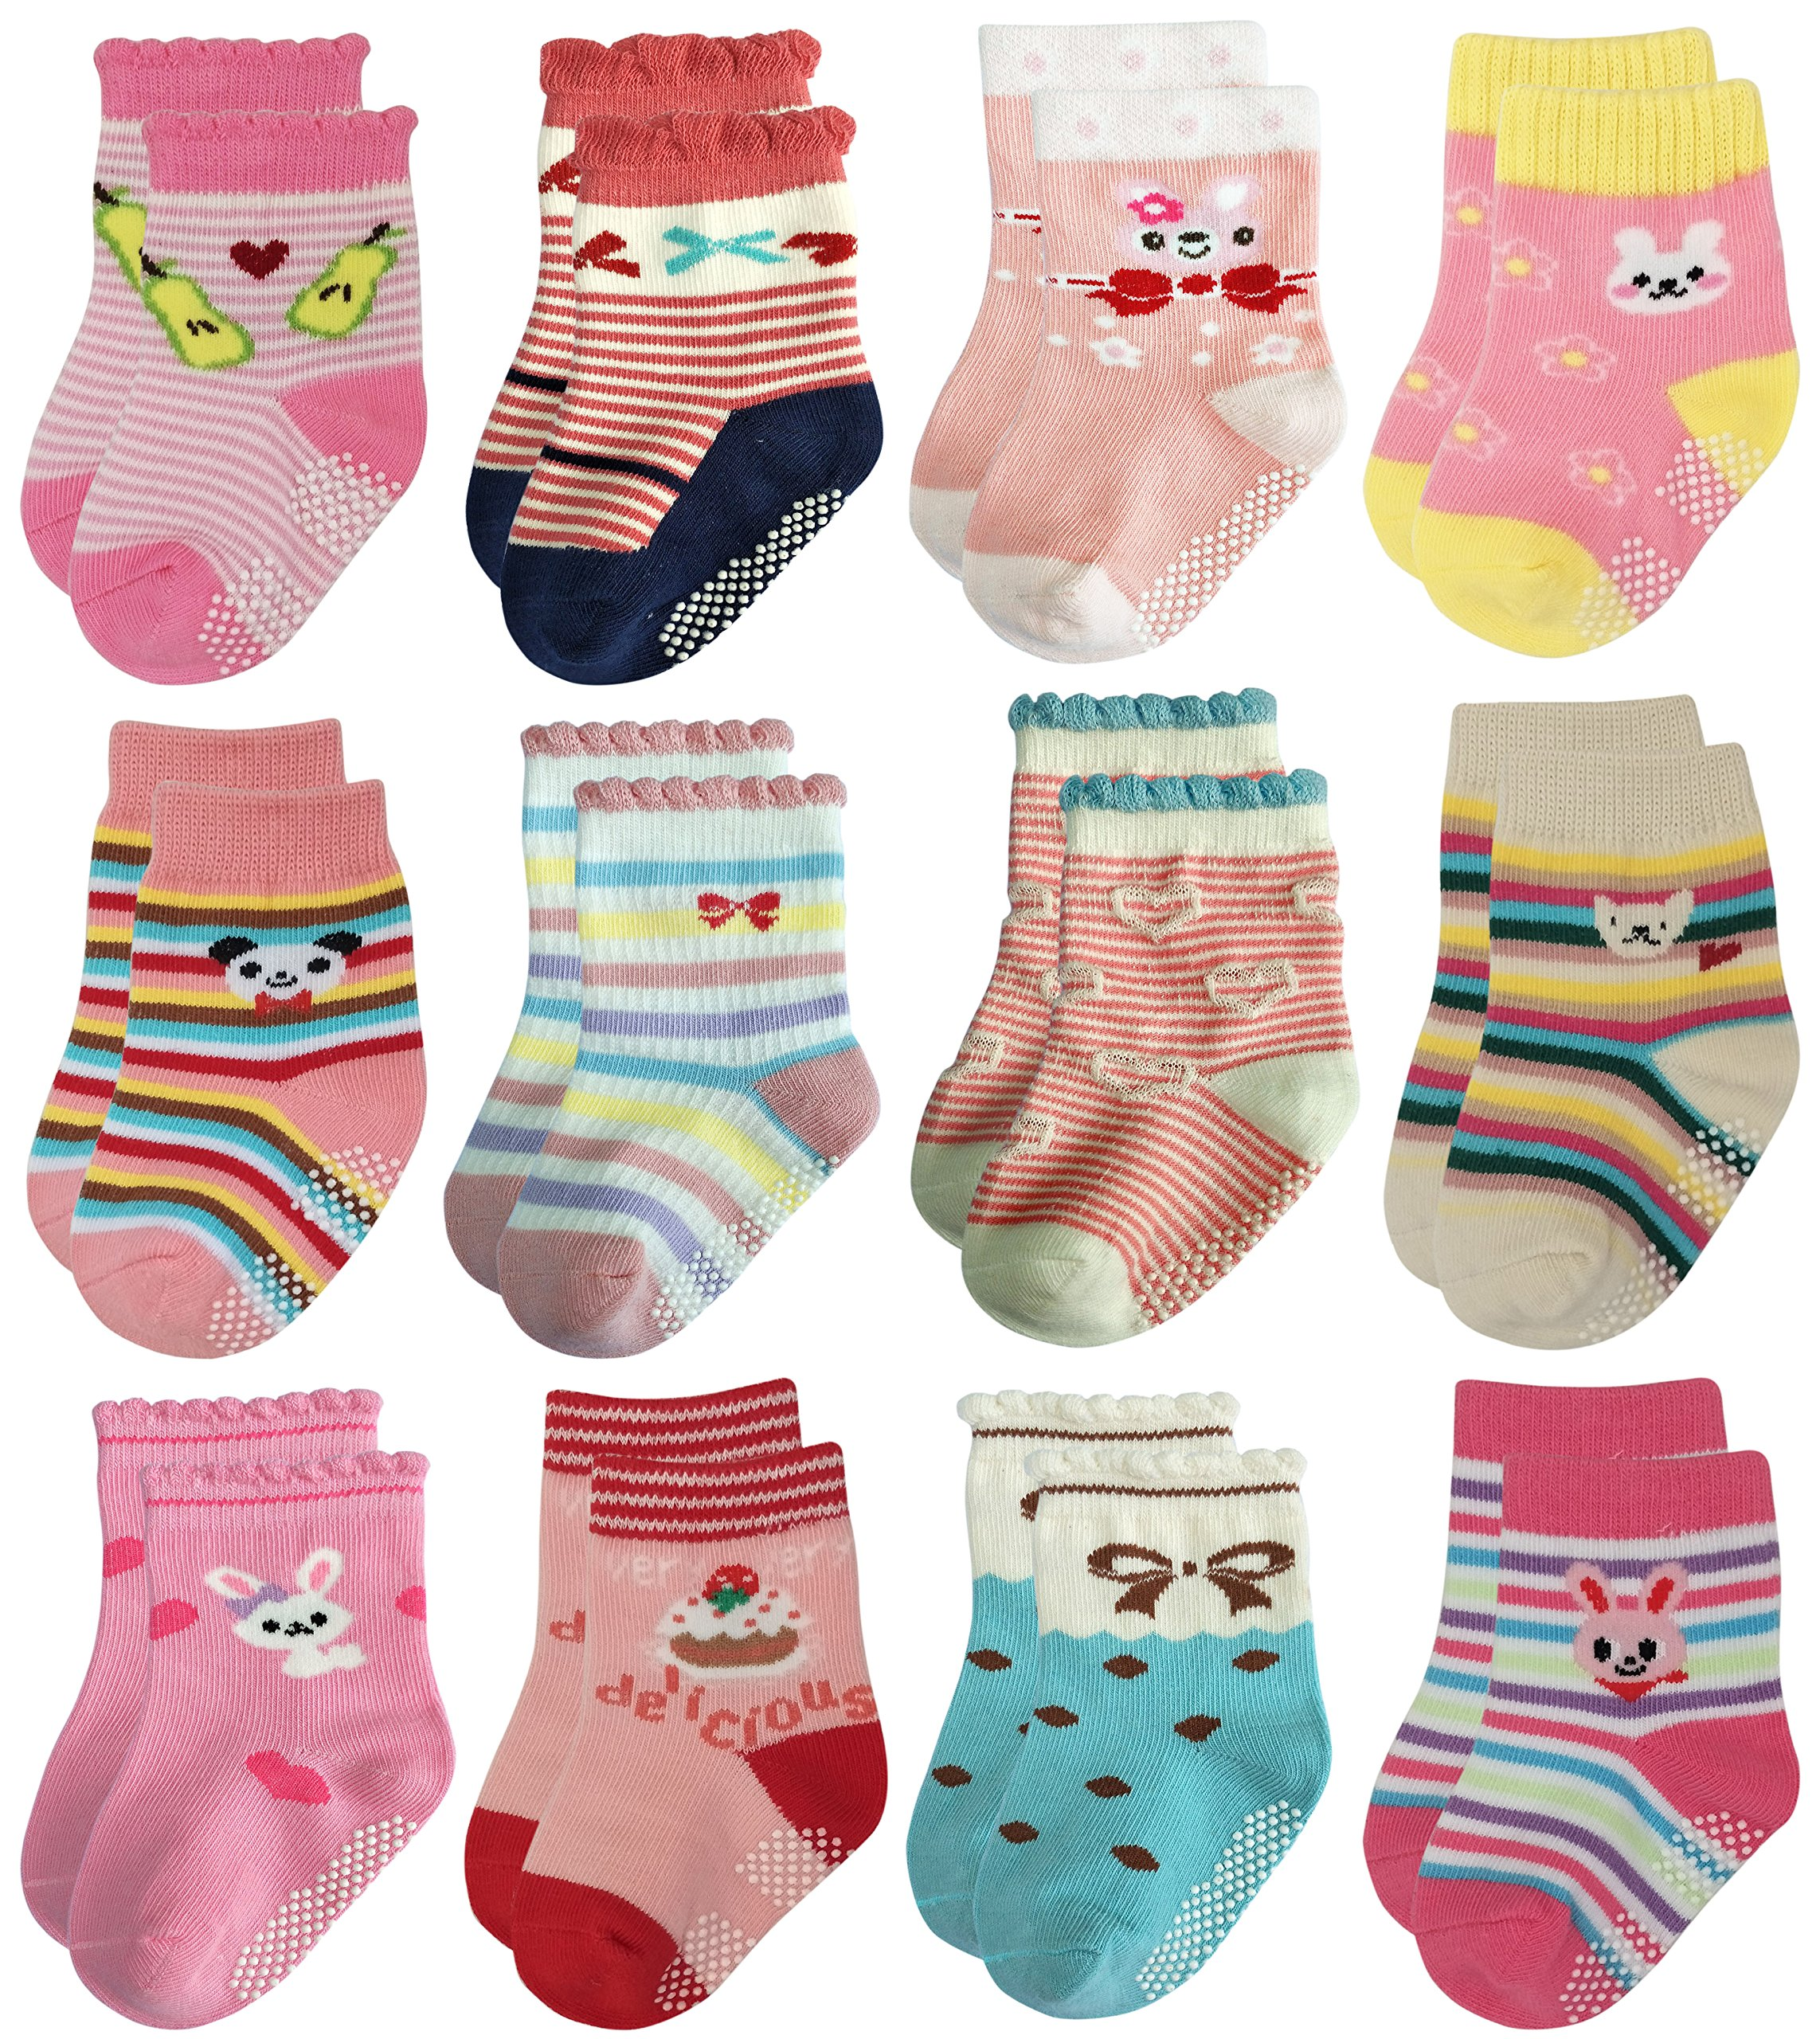 Deluxe Non Skid Anti Slip Slipper Cotton Dress Crew Socks With Grips For Baby Toddler Girls (3-5 Years, 12 designs/RG-72225)